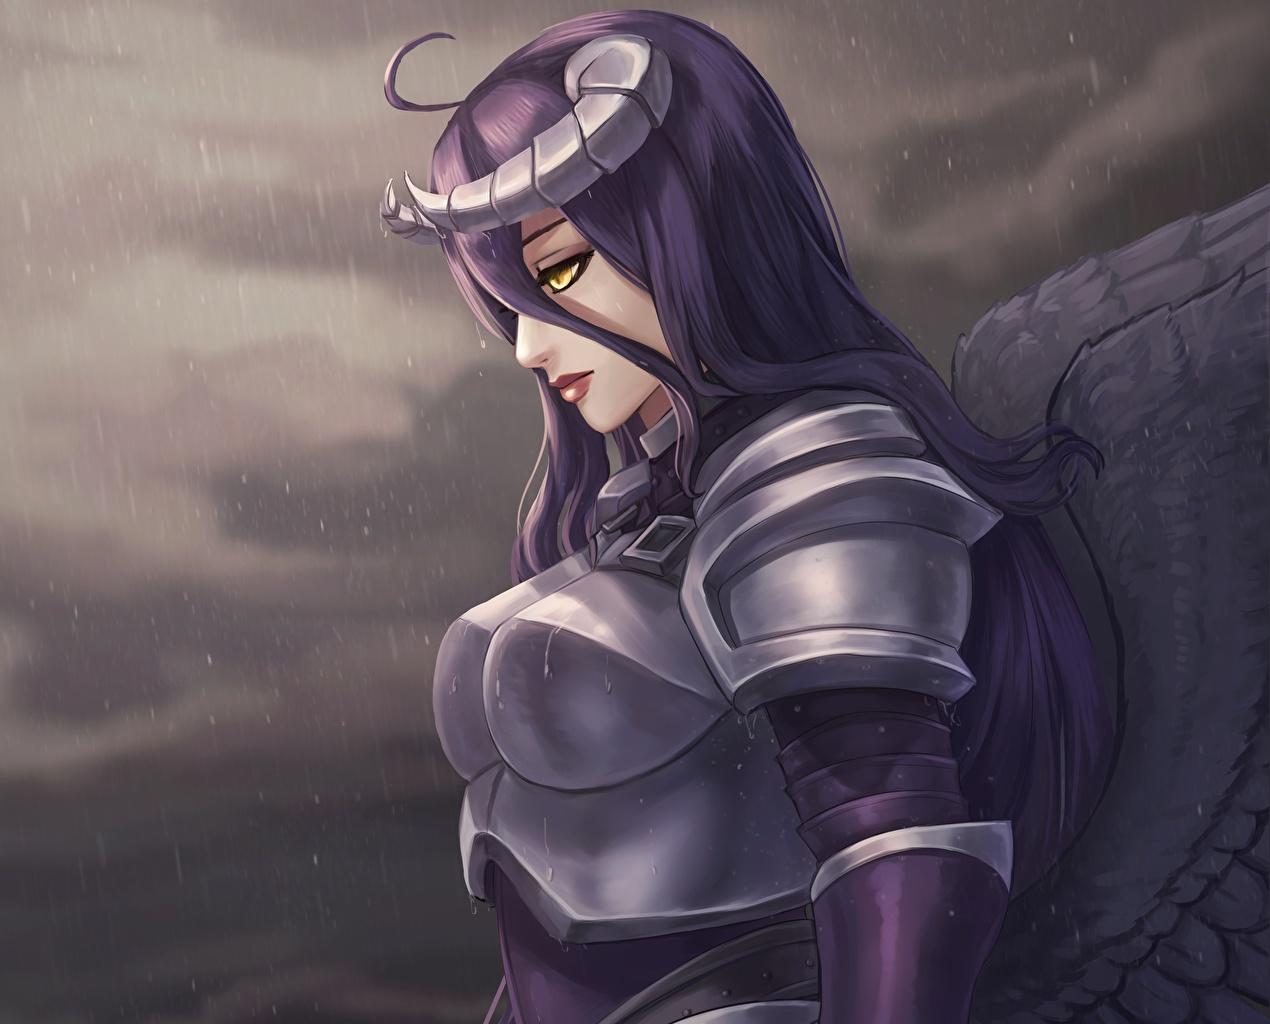 Картинки Overlord Доспехи Воители Armored Albedo Девушки Игры броня воины